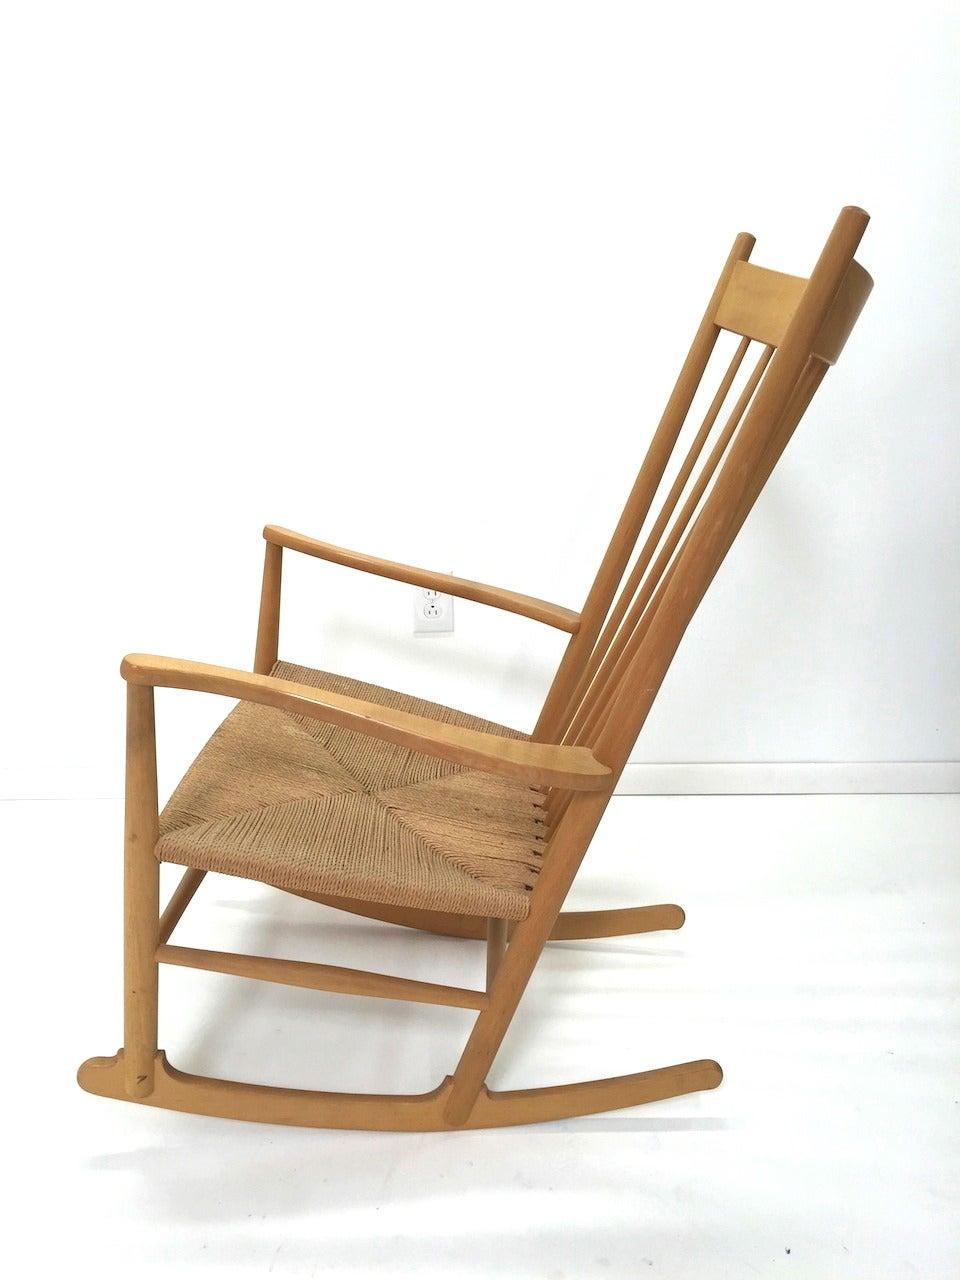 Hans Wegner J16 Danish Modern Rocking Chair By Fdb Mobler